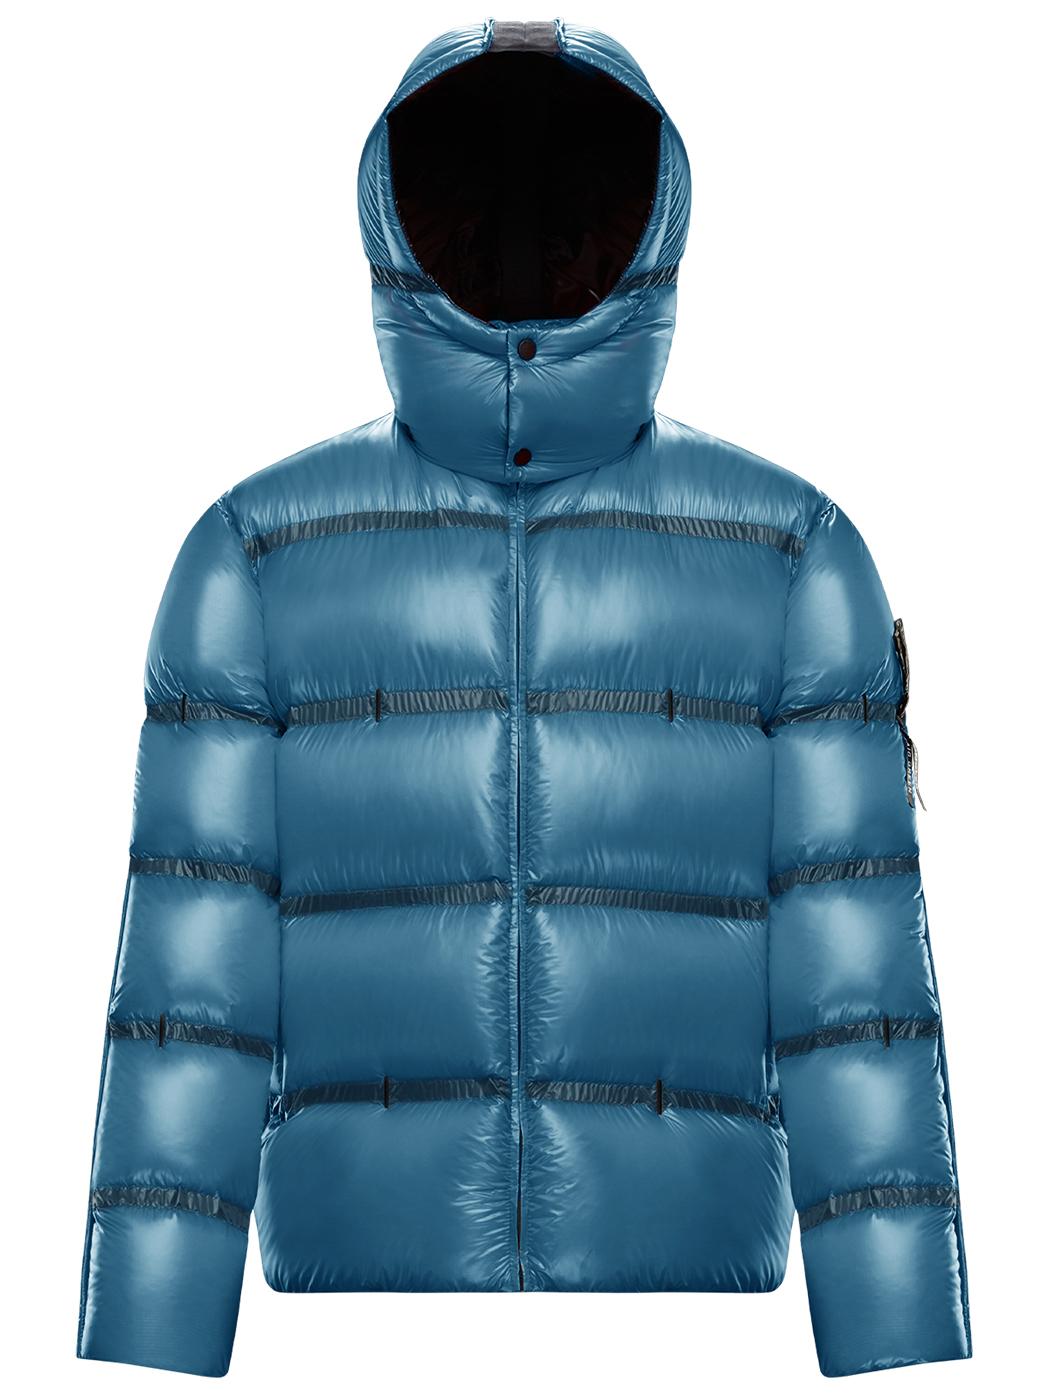 Ramis Hooded Jacket